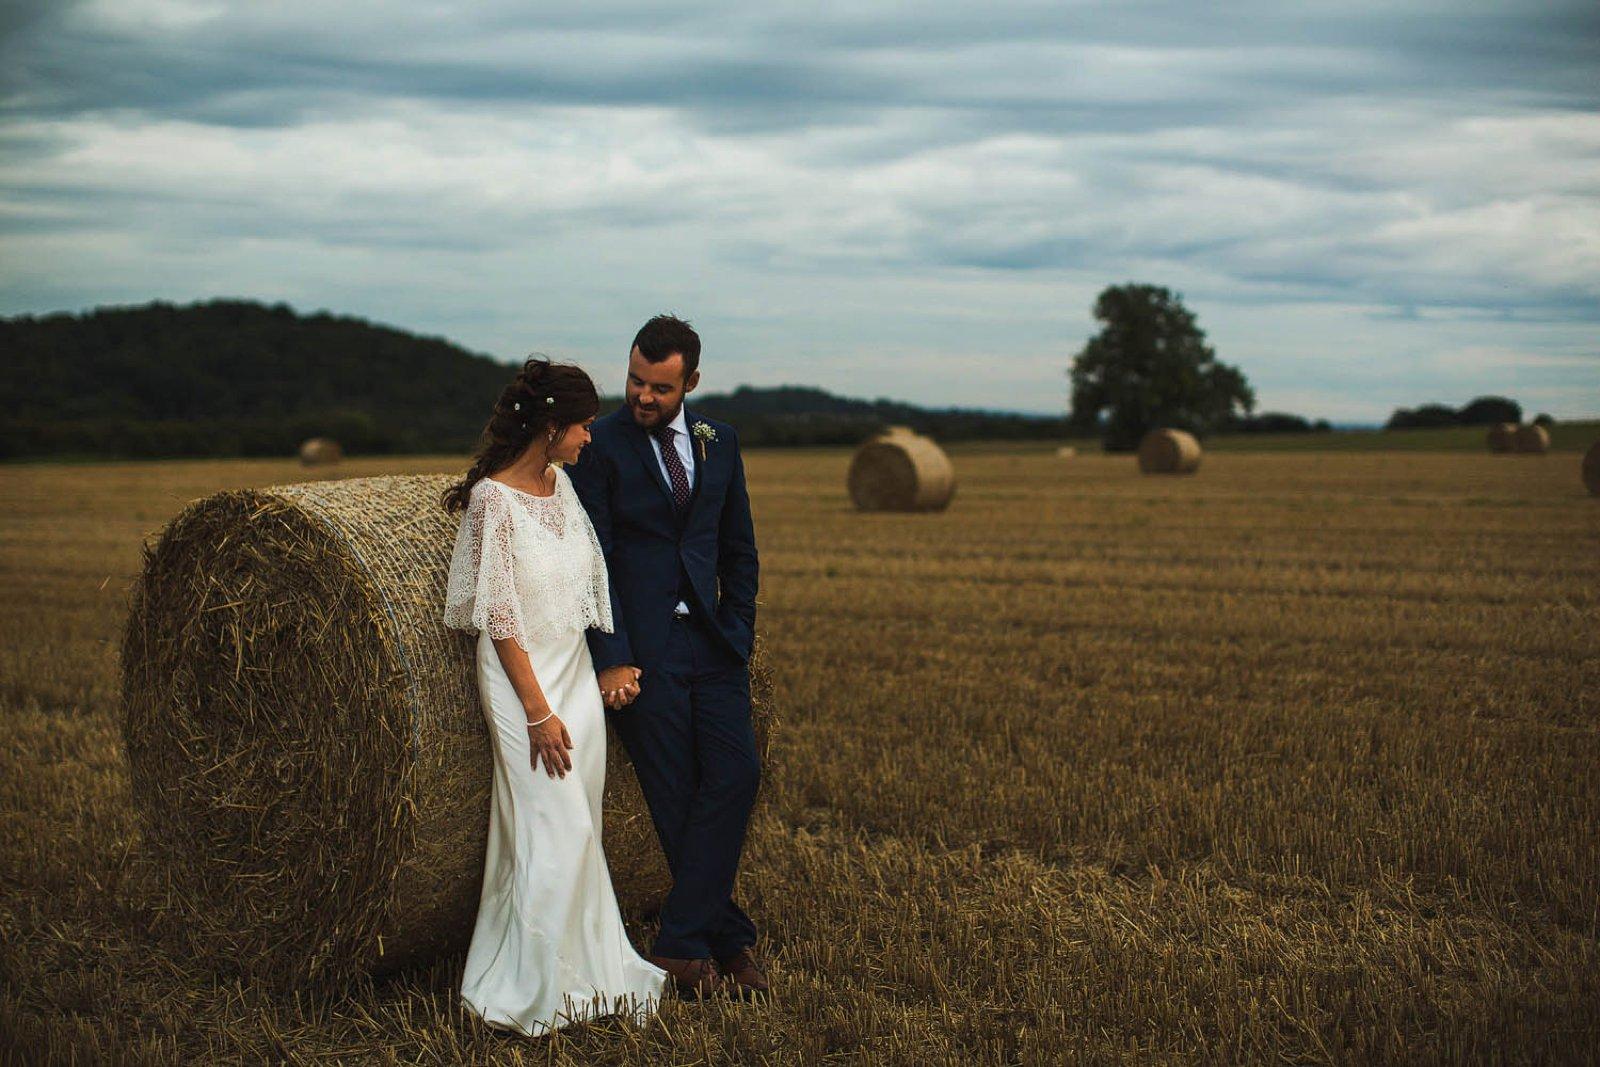 Swancar farm wedding photography